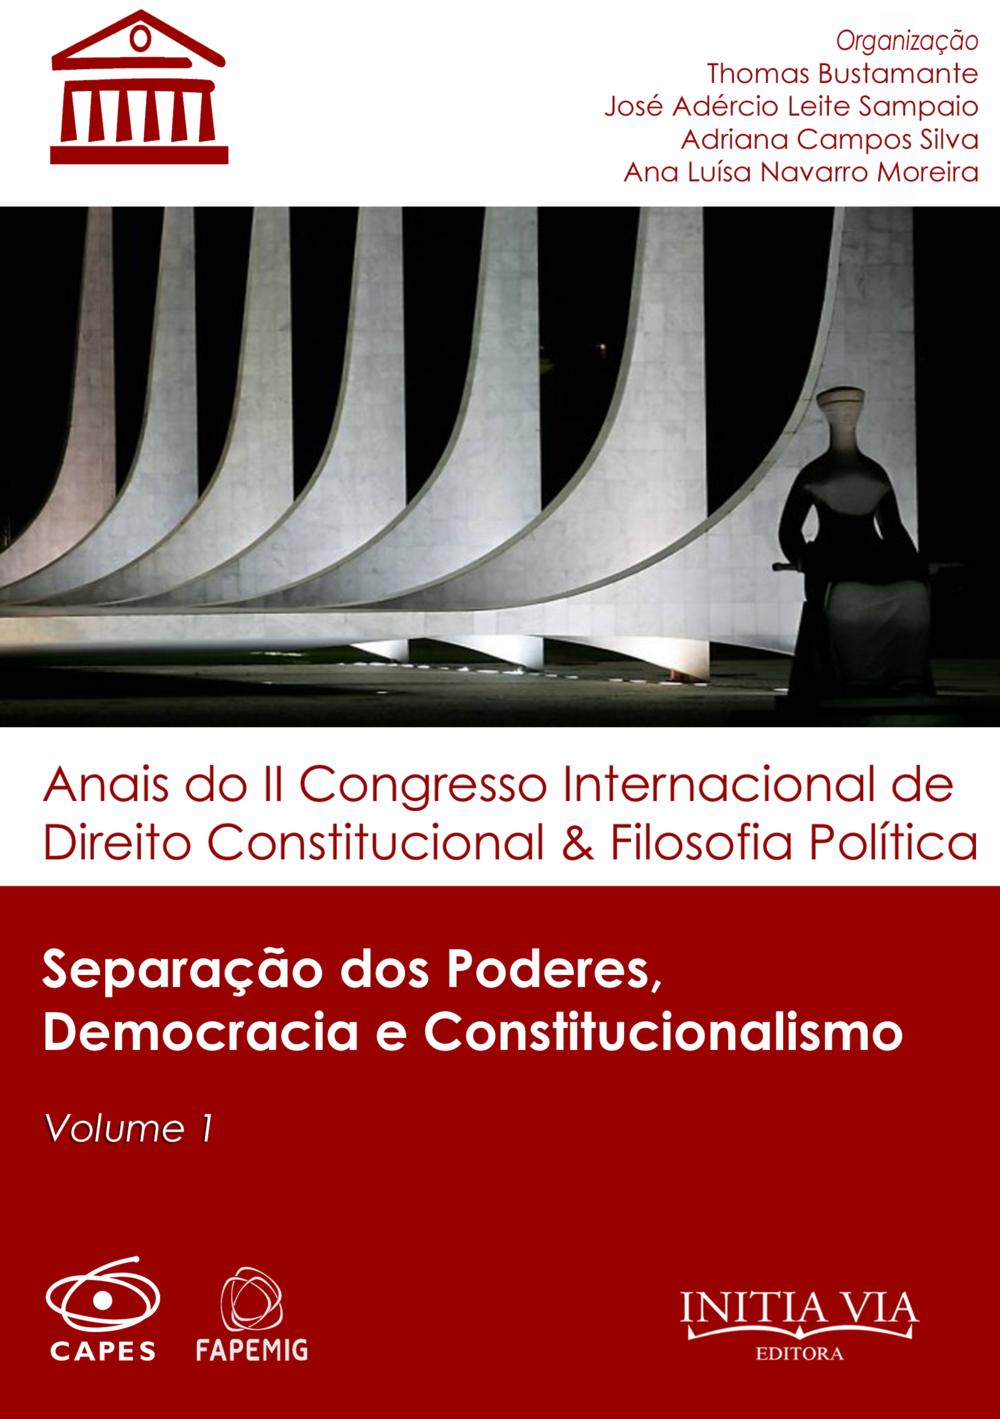 Bustamante_Congresso_DCFP15_V01.png